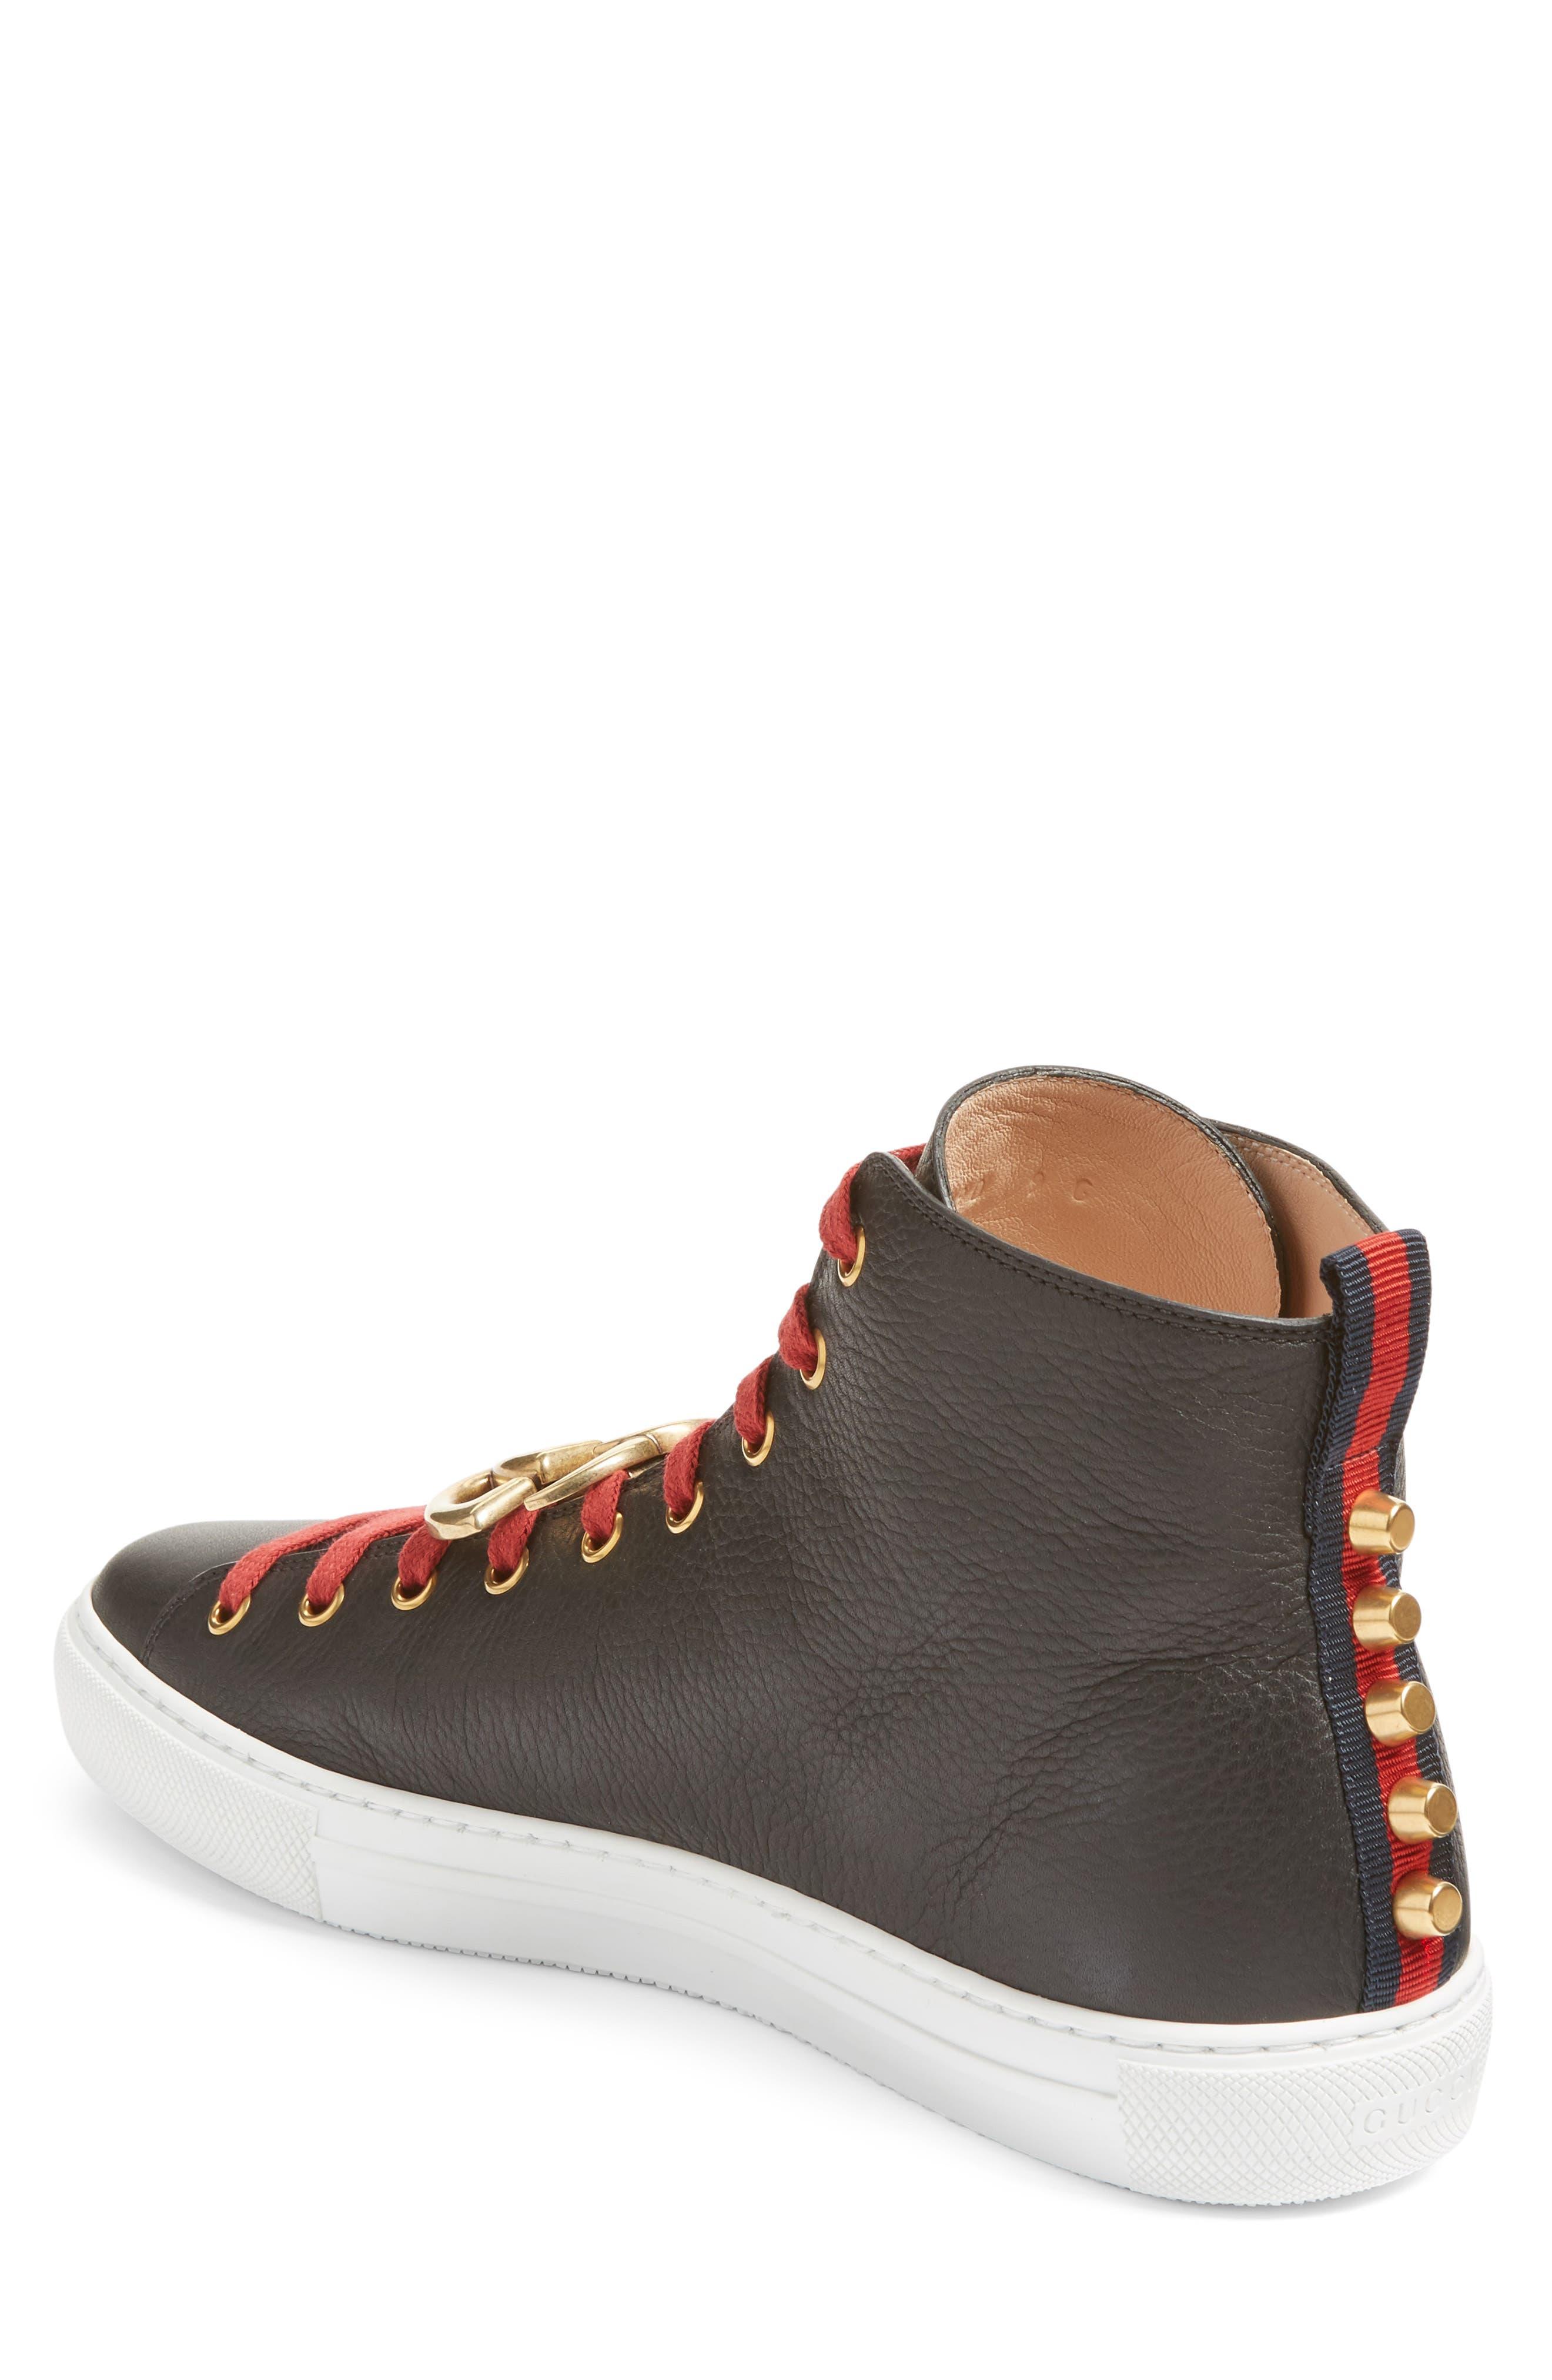 Major High Top Sneaker,                             Alternate thumbnail 2, color,                             007